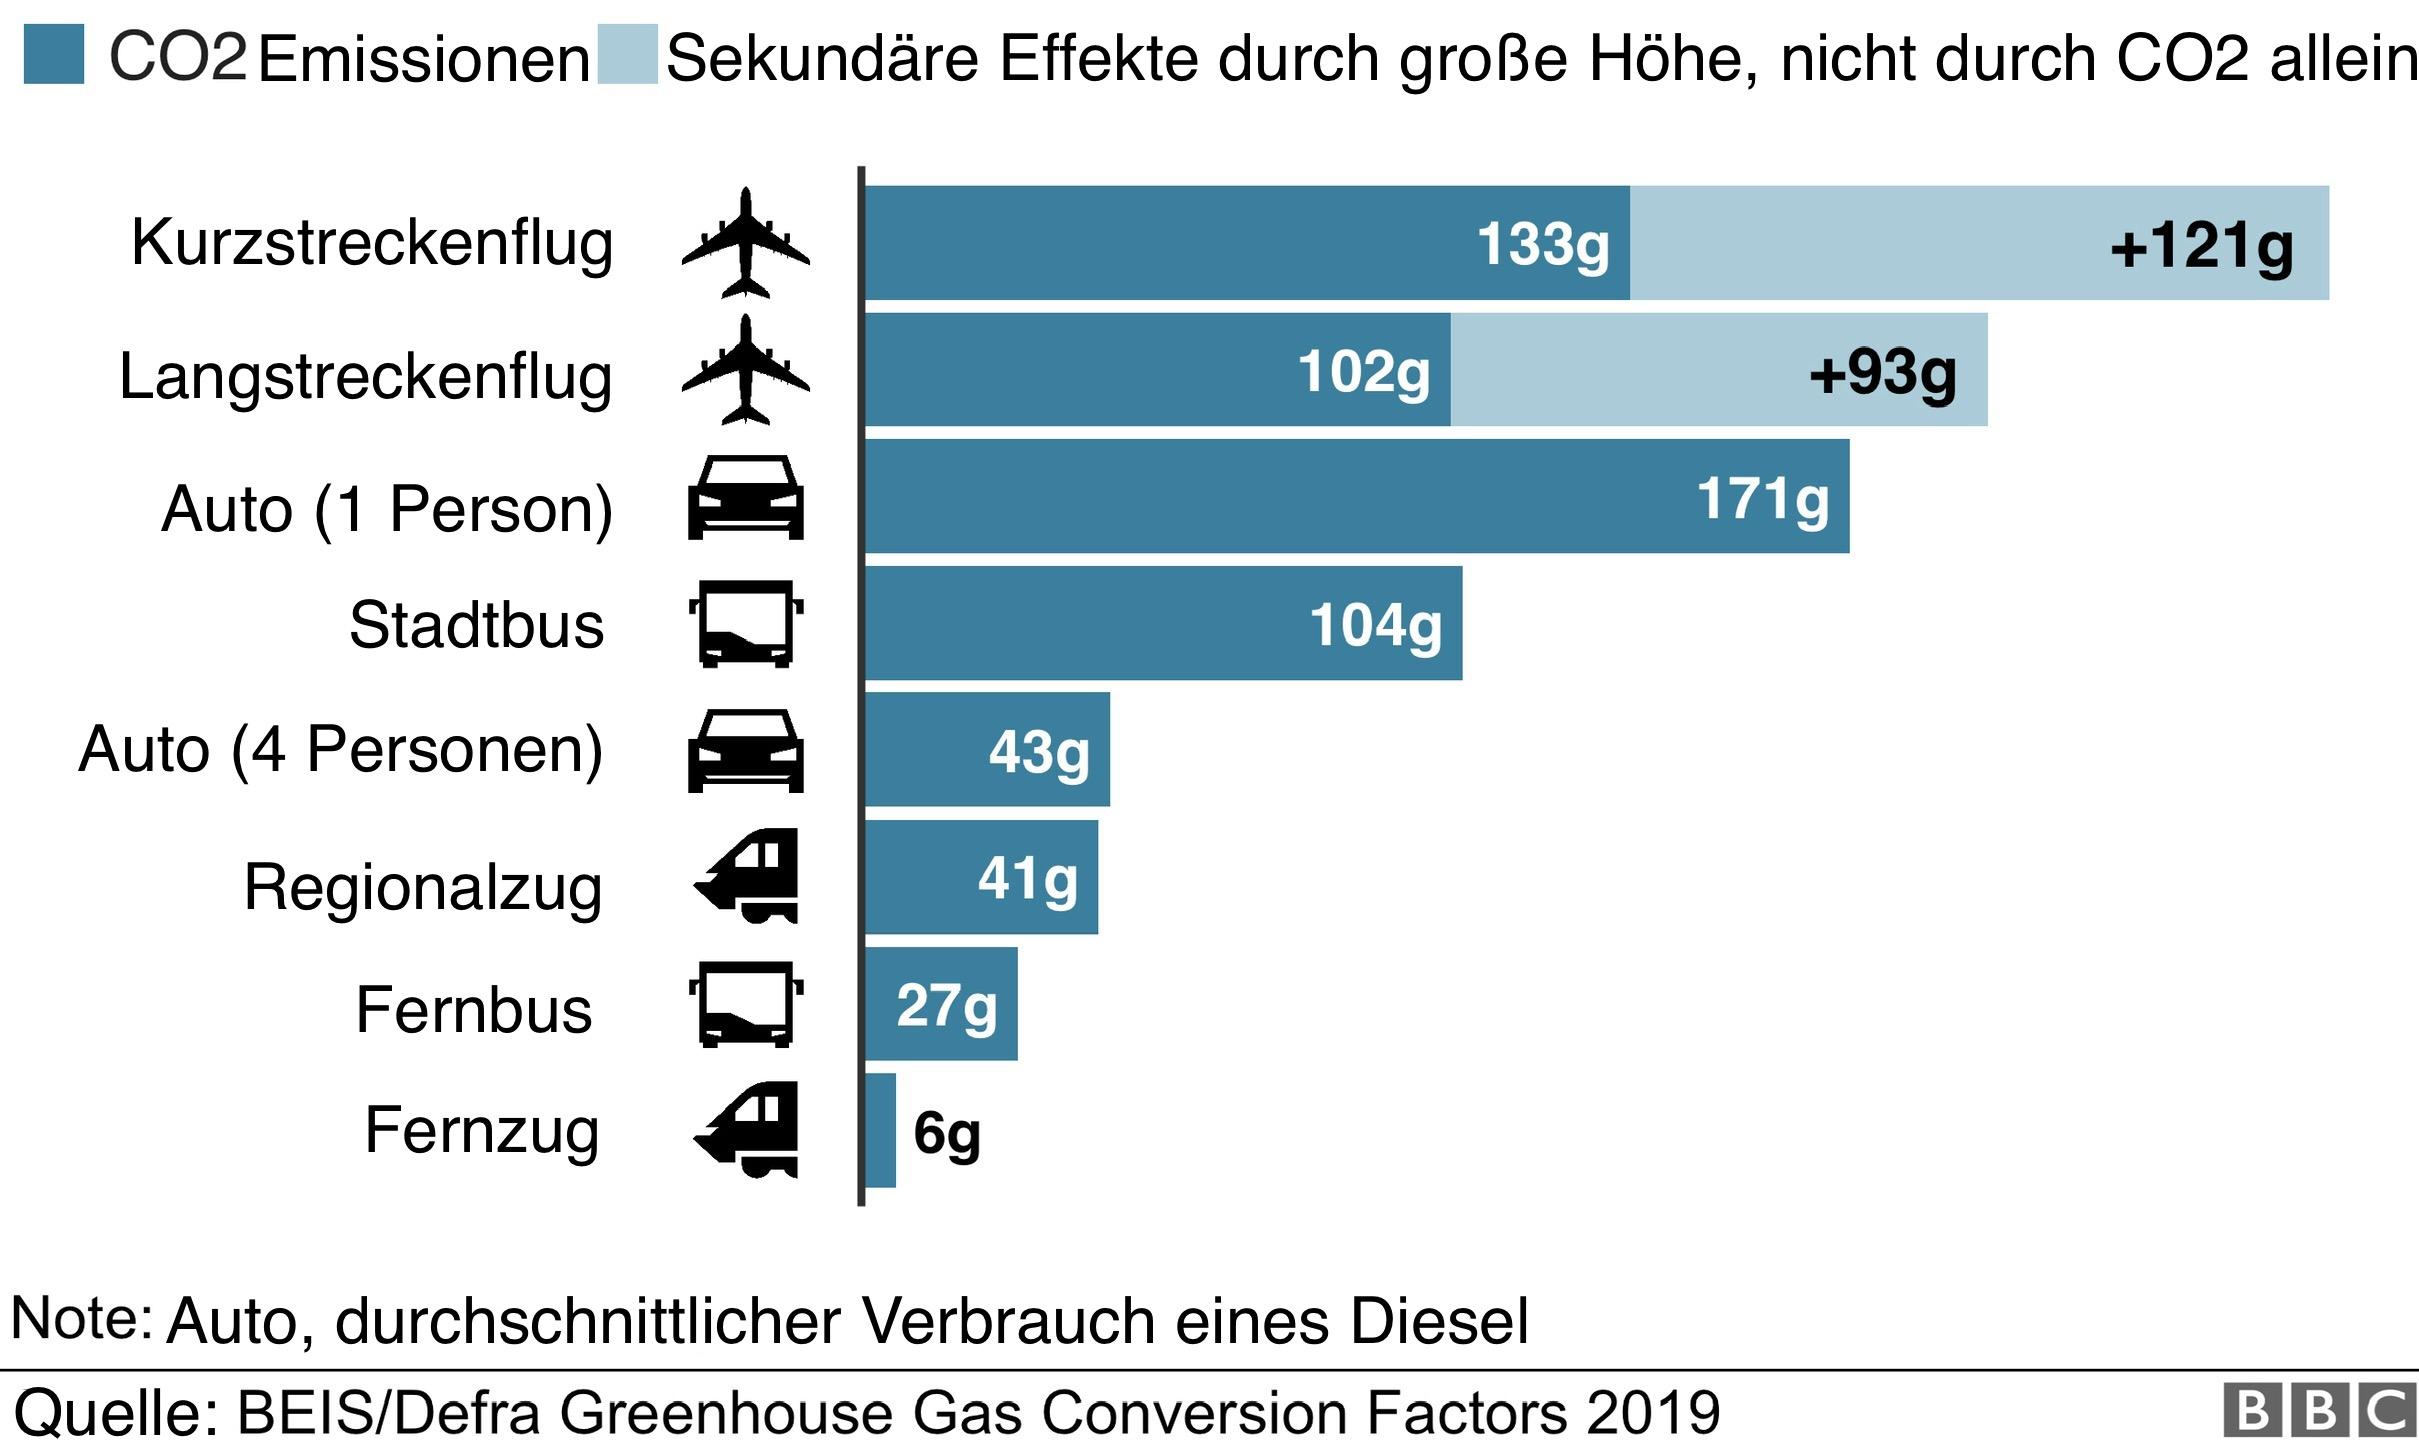 CO2 Ausstoß pro Passagier